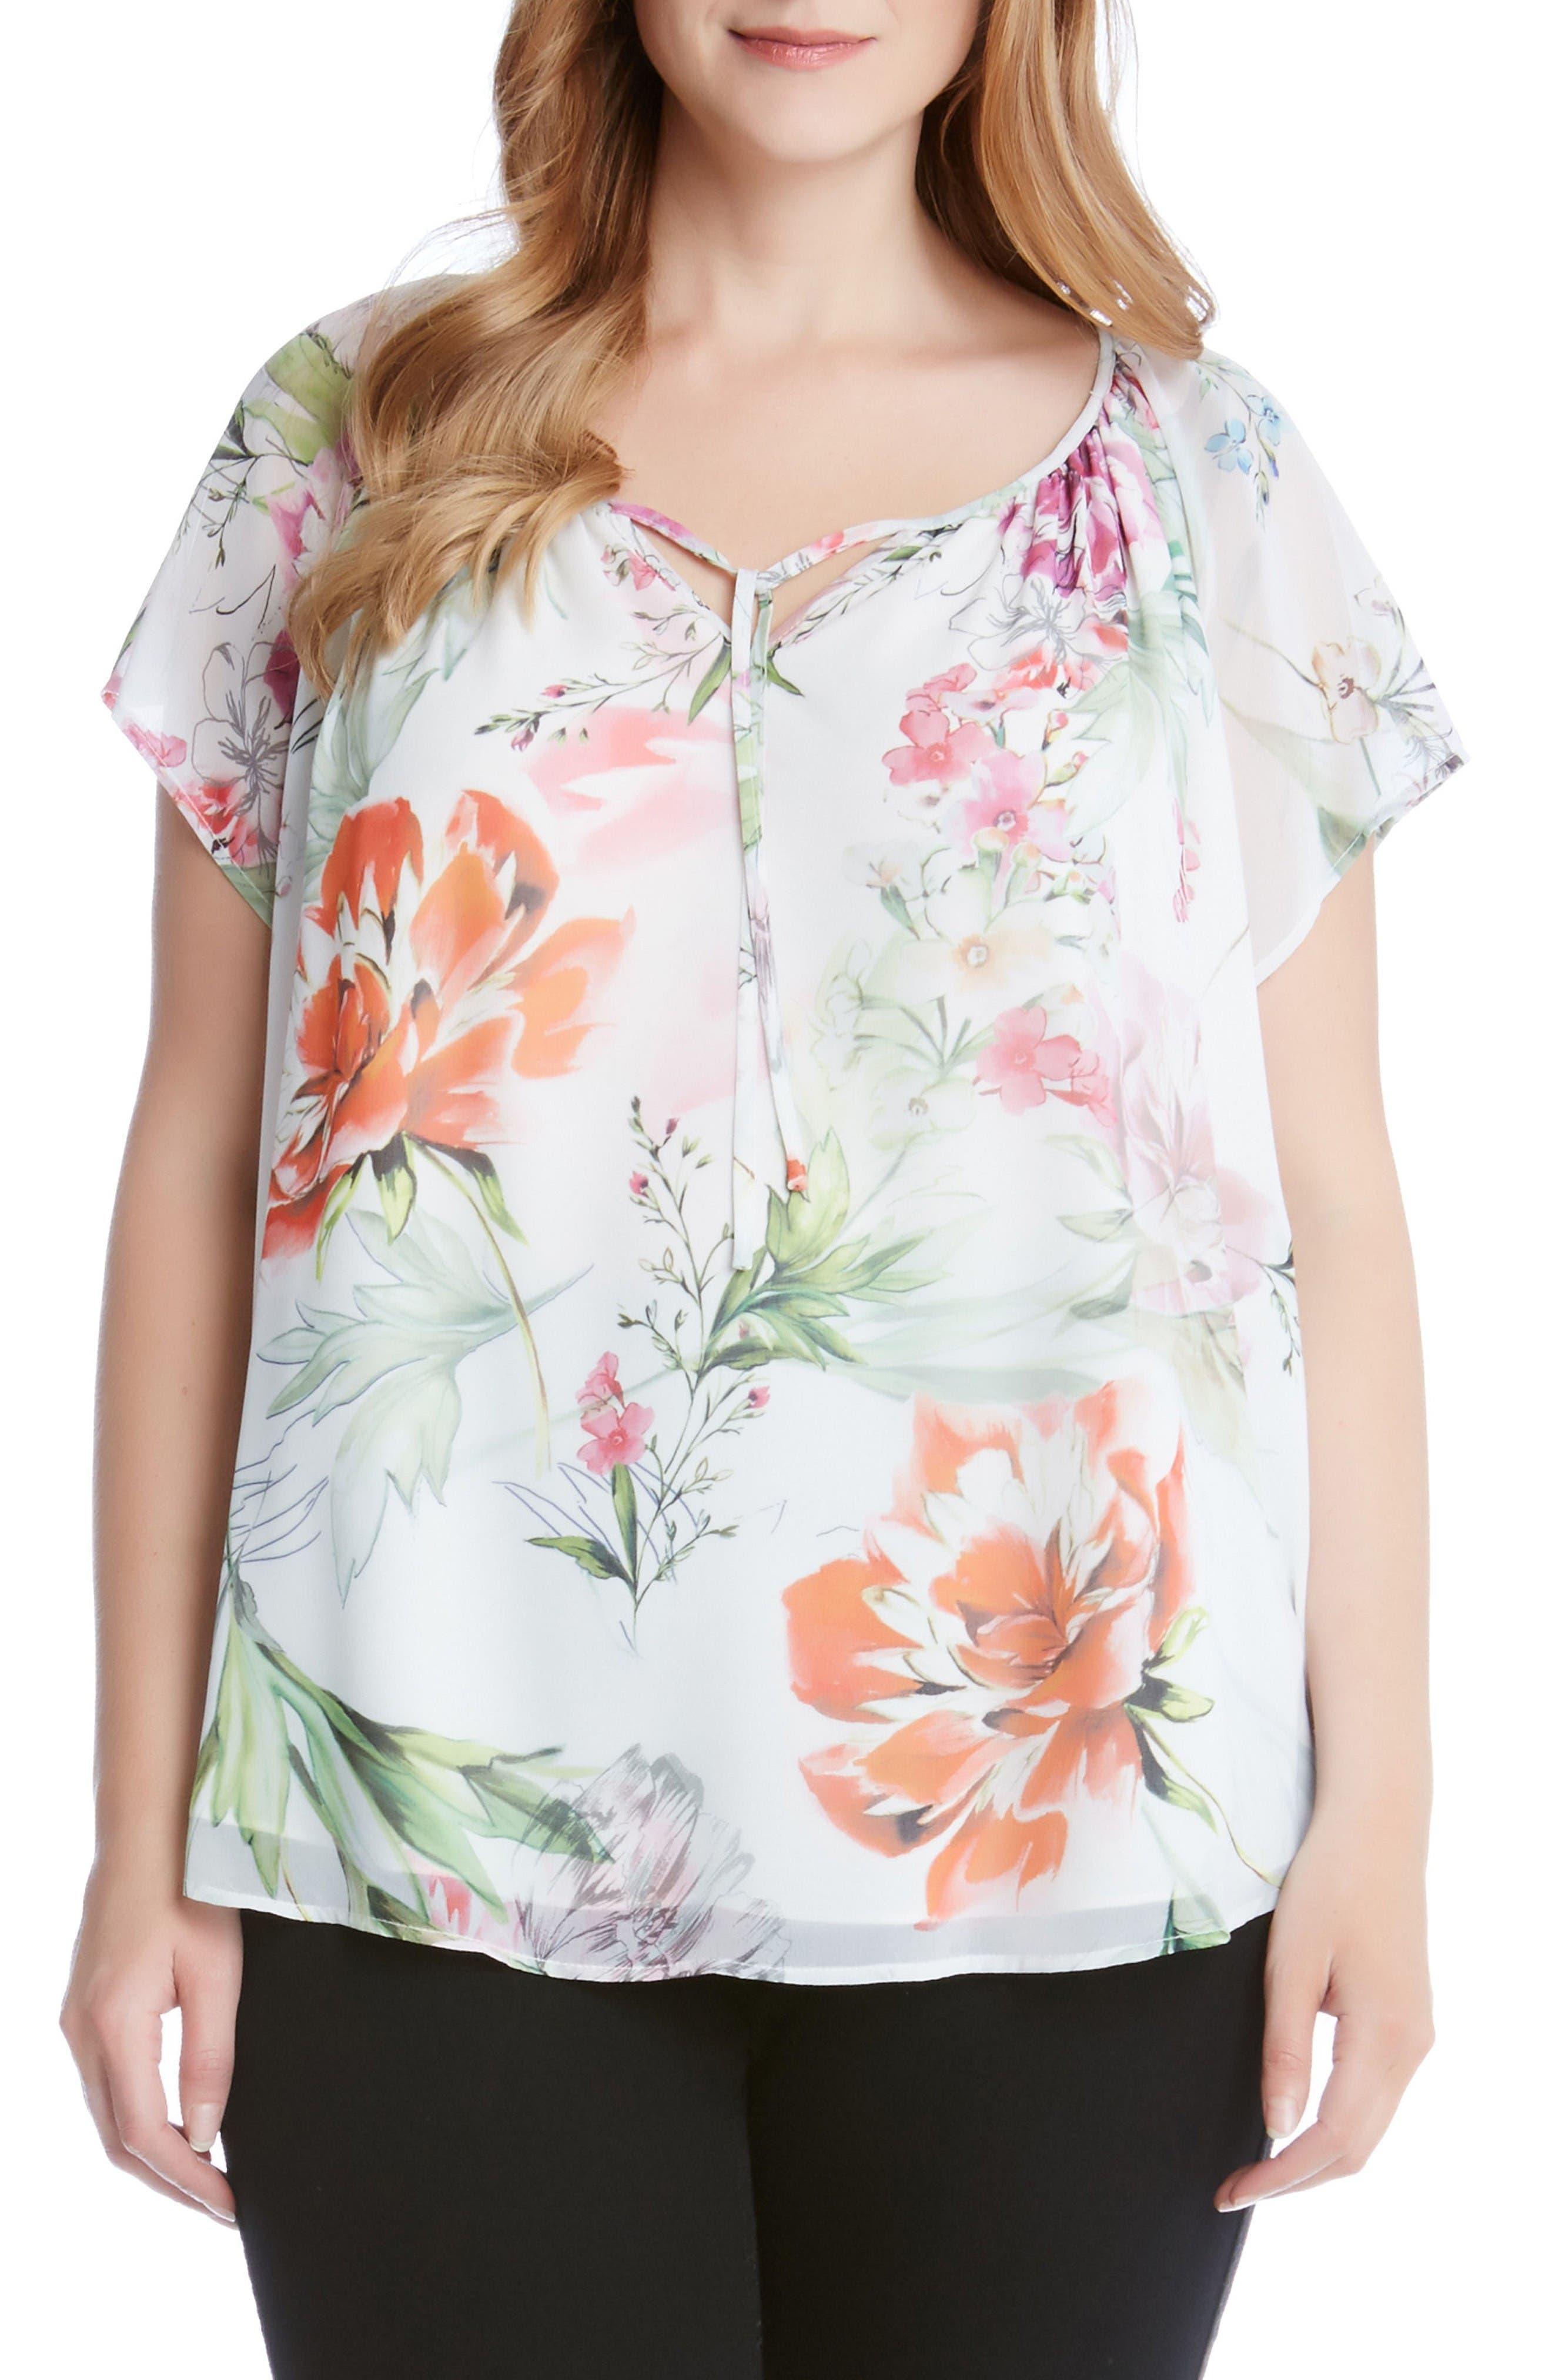 Alternate Image 1 Selected - Karen Kane Keyhole Tie Floral Top (Plus Size)